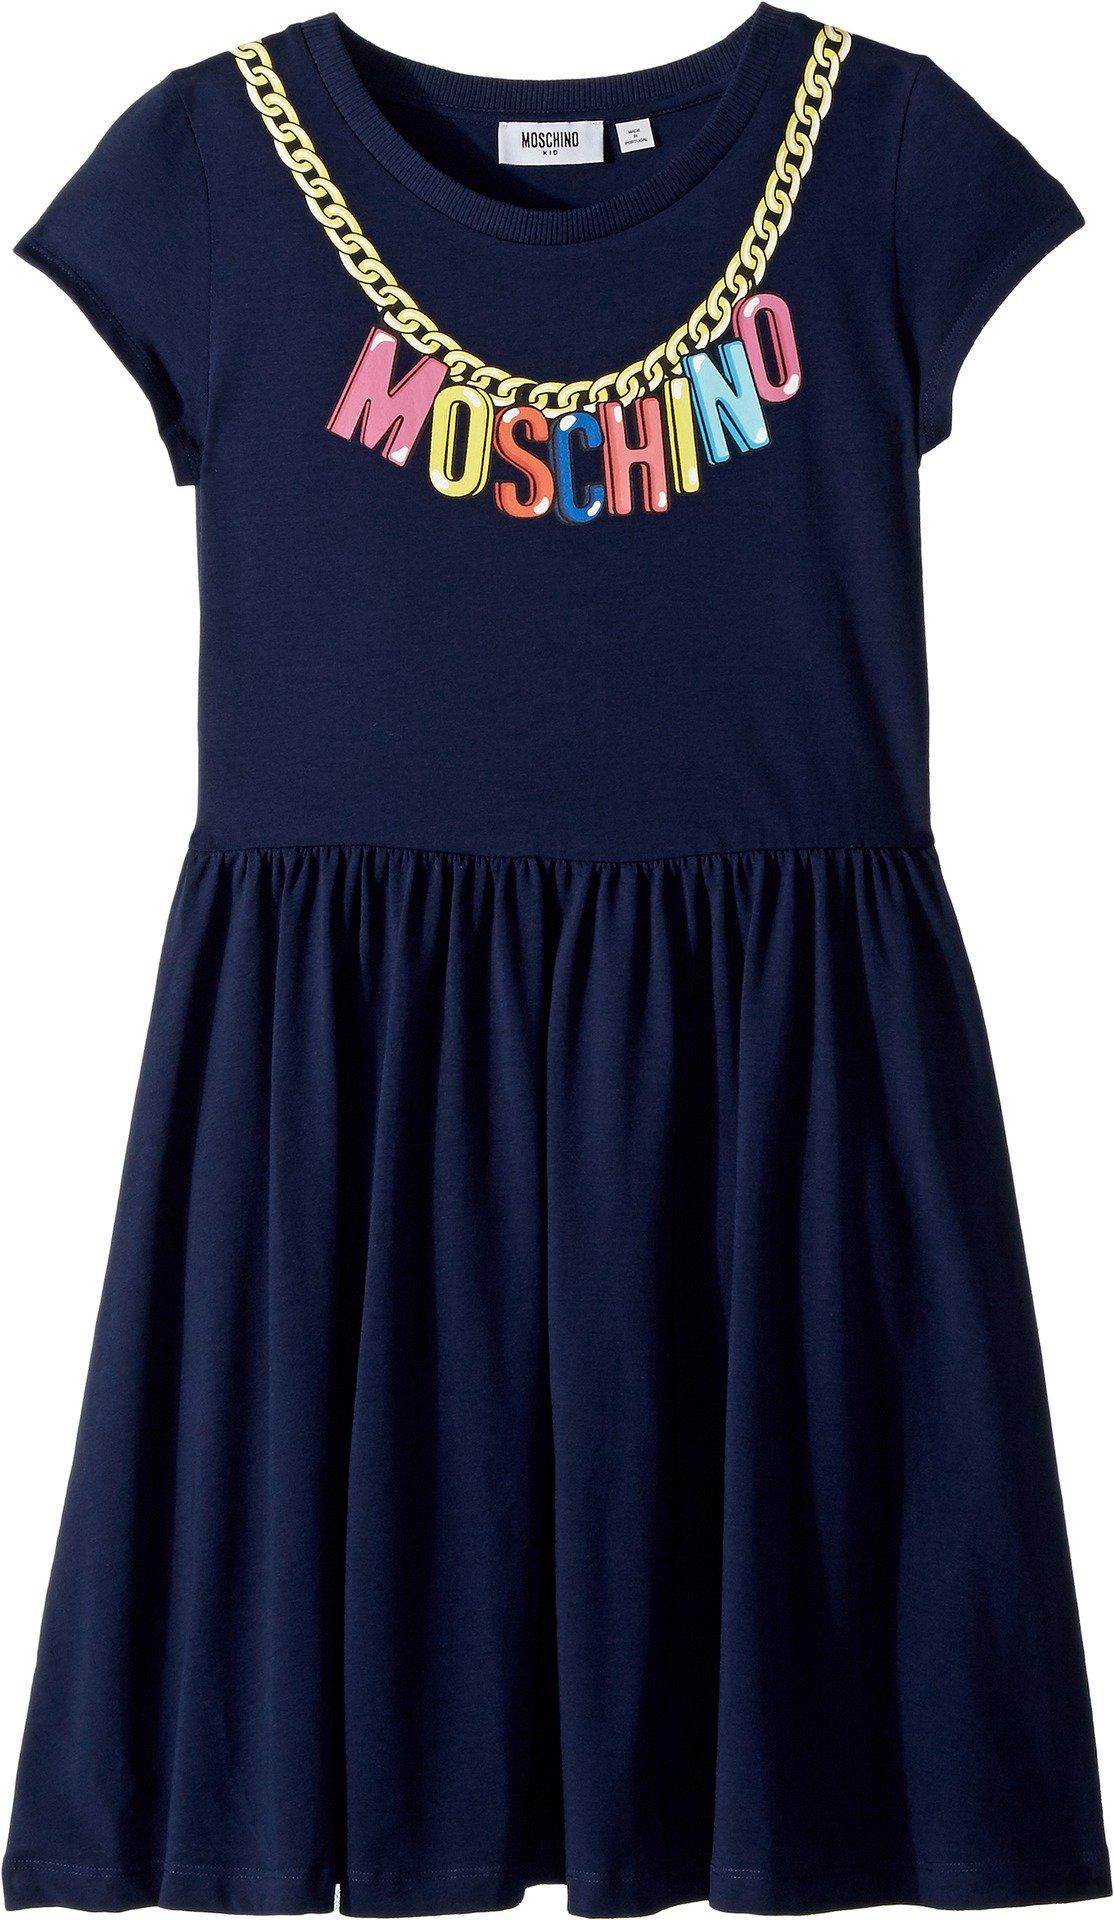 Moschino Kids Girl's Short Sleeve Logo Necklace Graphic Dress (Big Kids) Navy 14